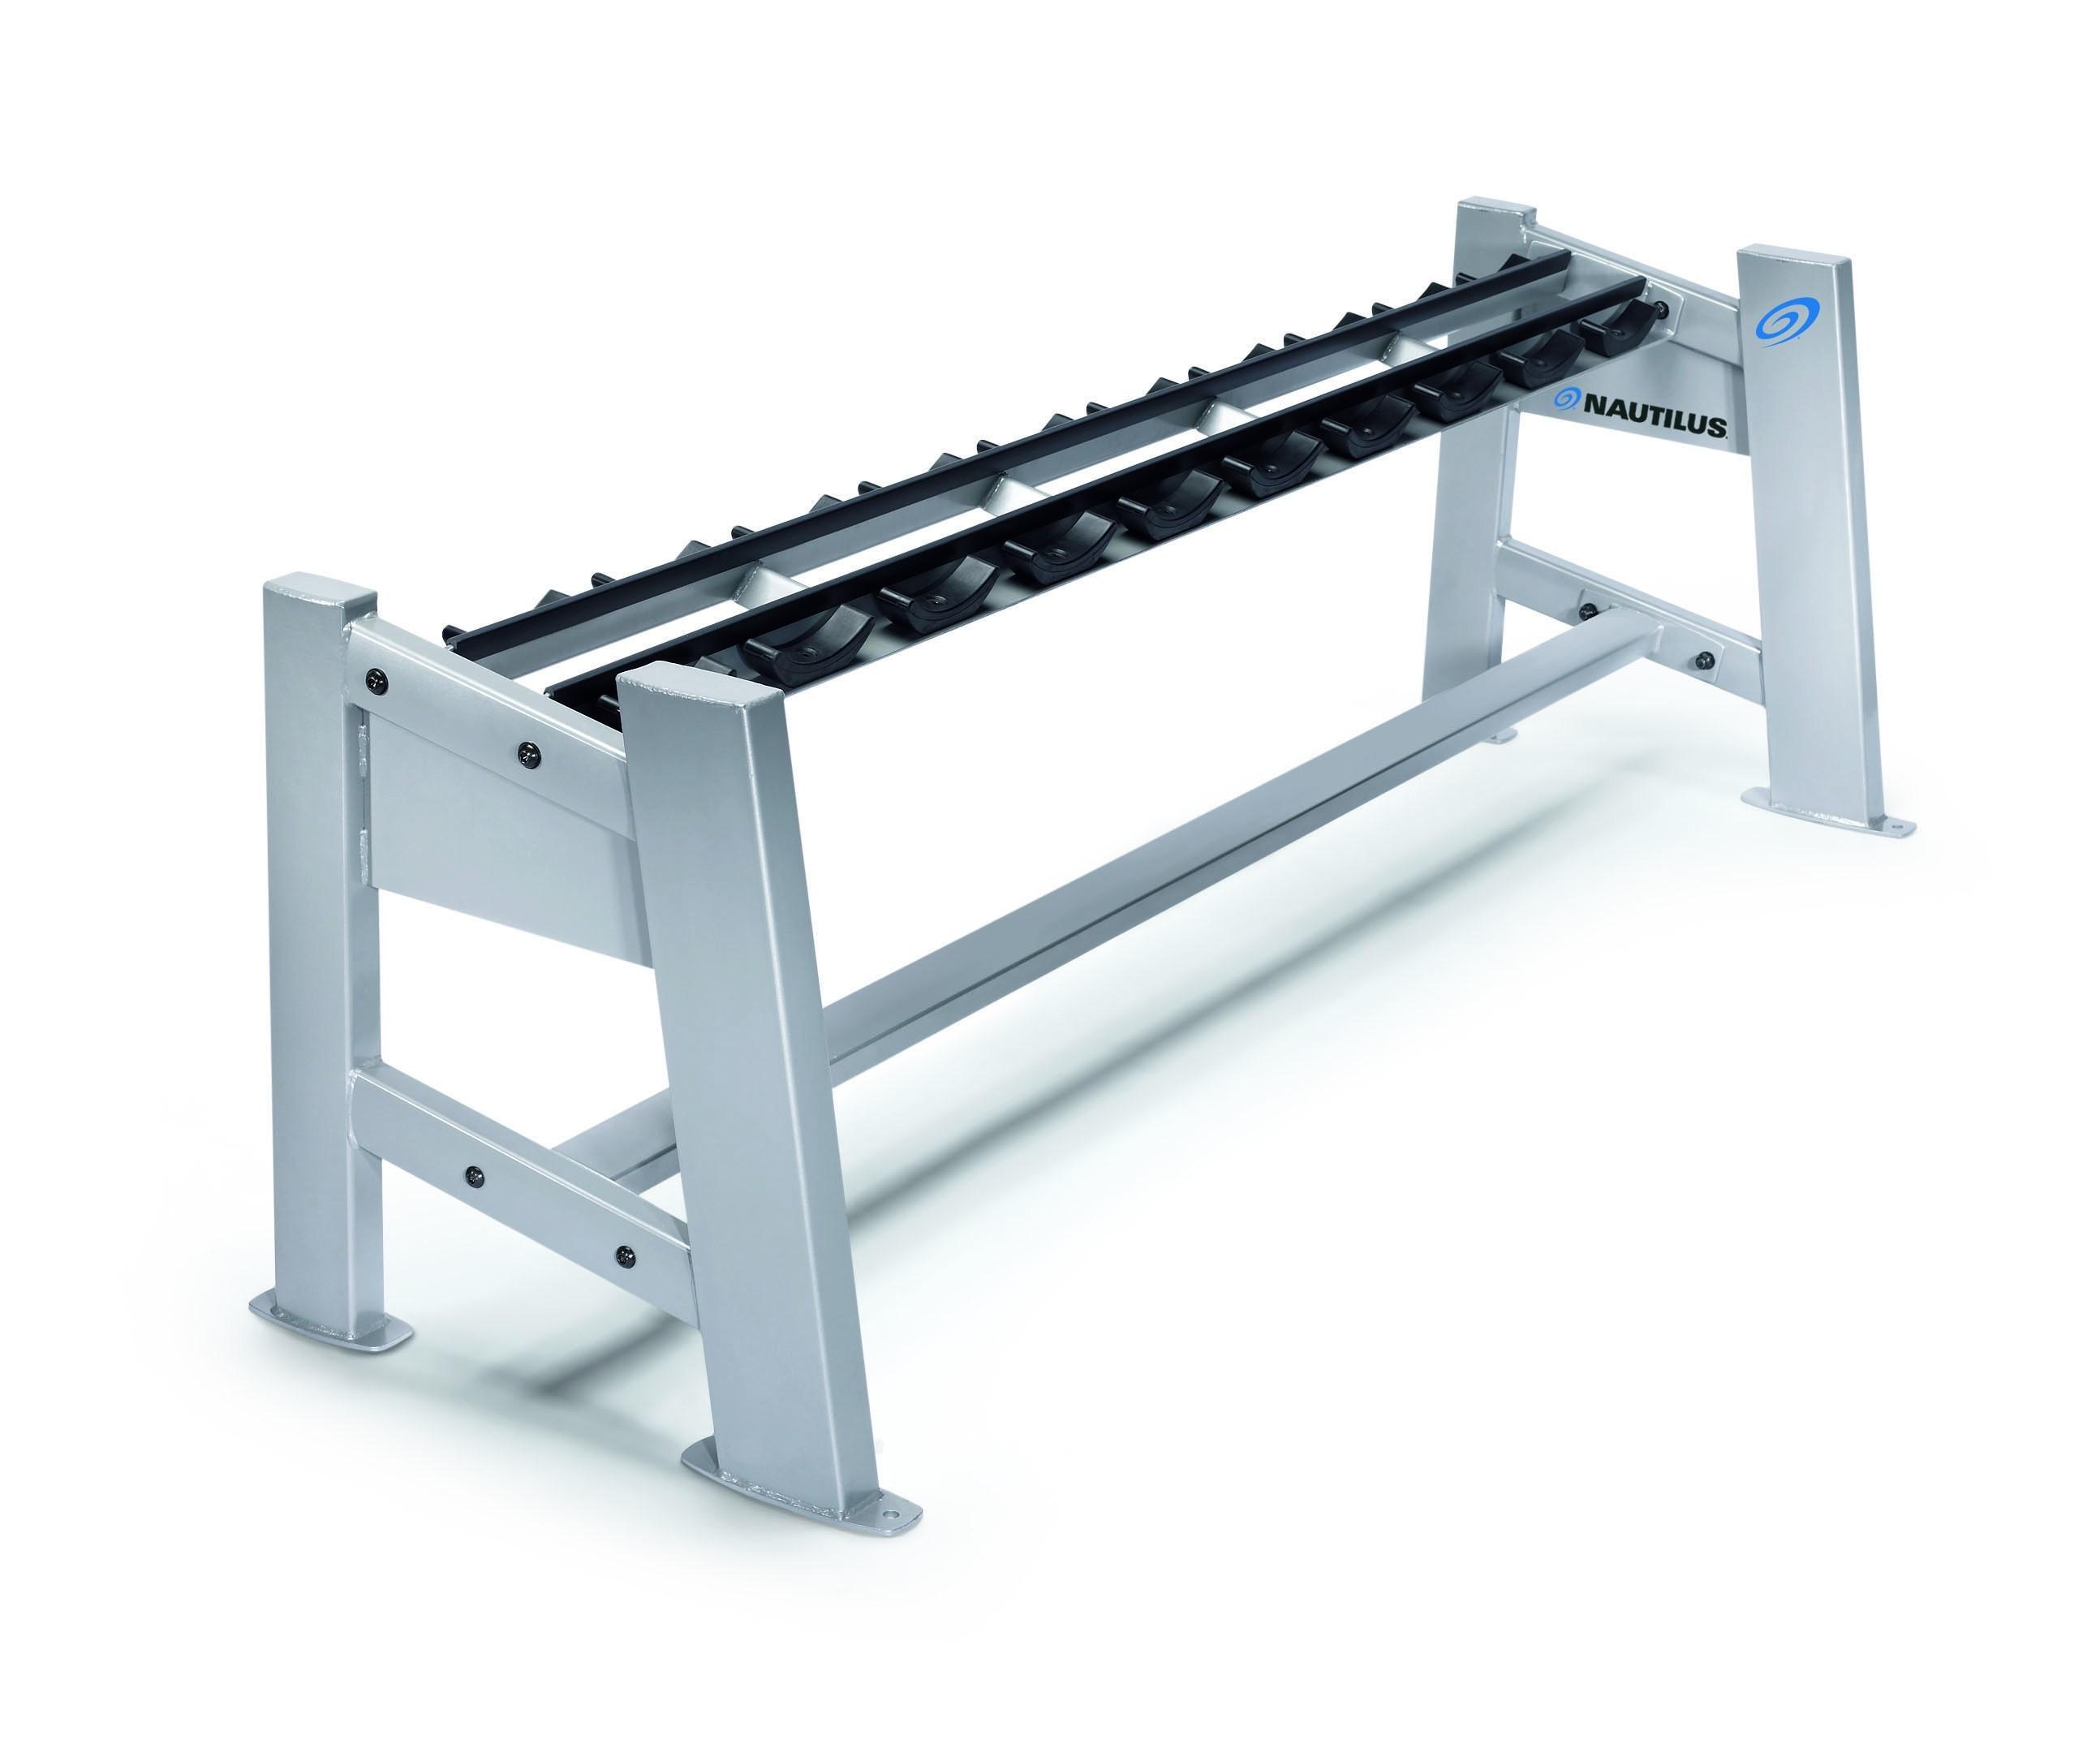 Nautilus® One-Tier Dumbbell Rack - New